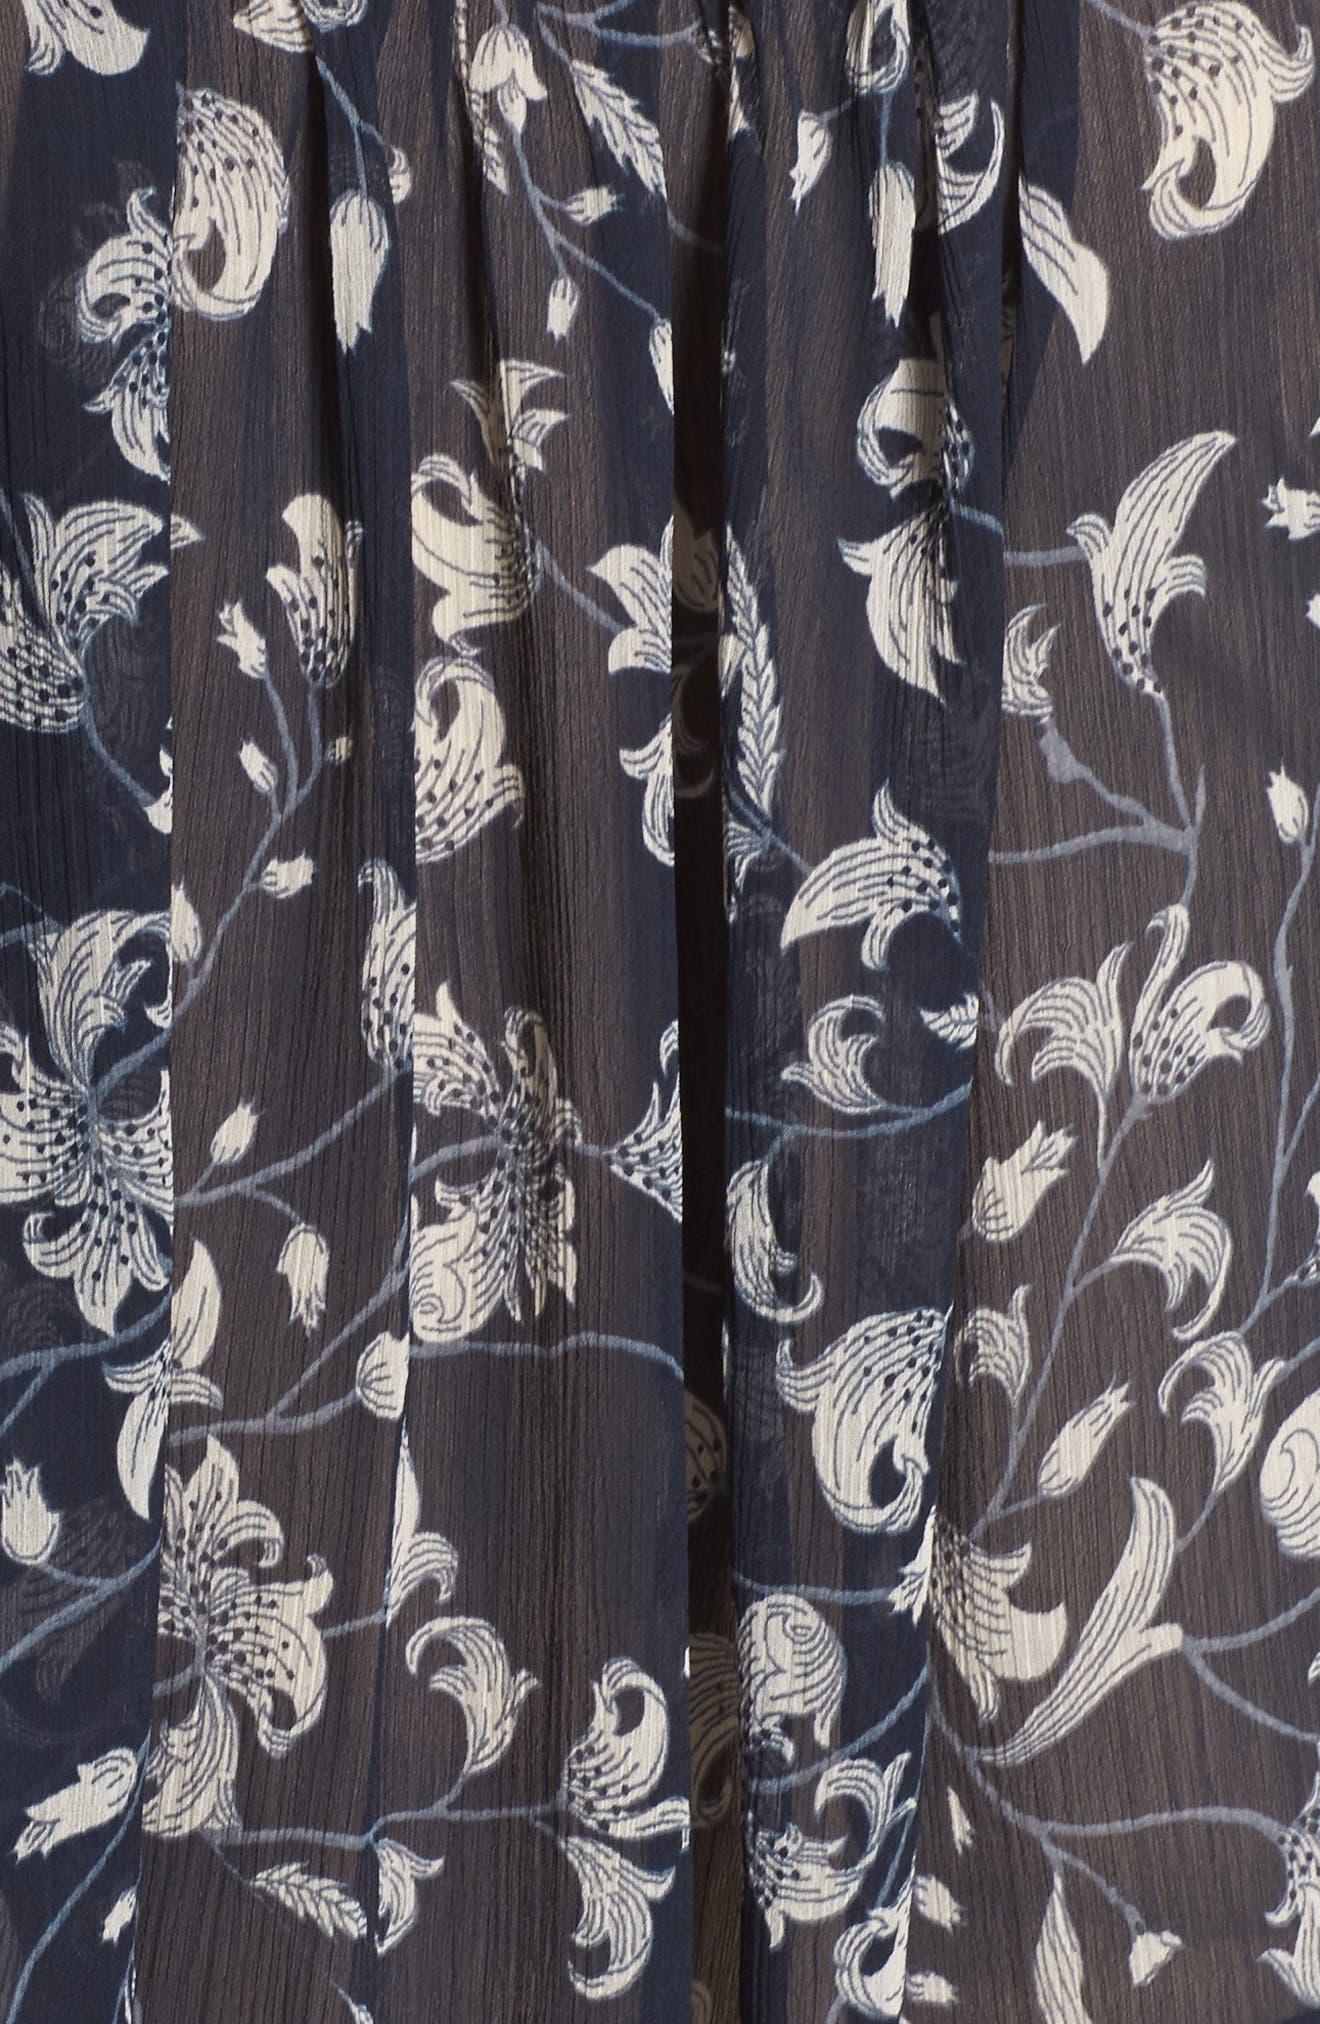 Floral Print Ruffle Top,                             Alternate thumbnail 5, color,                             Blue Multi